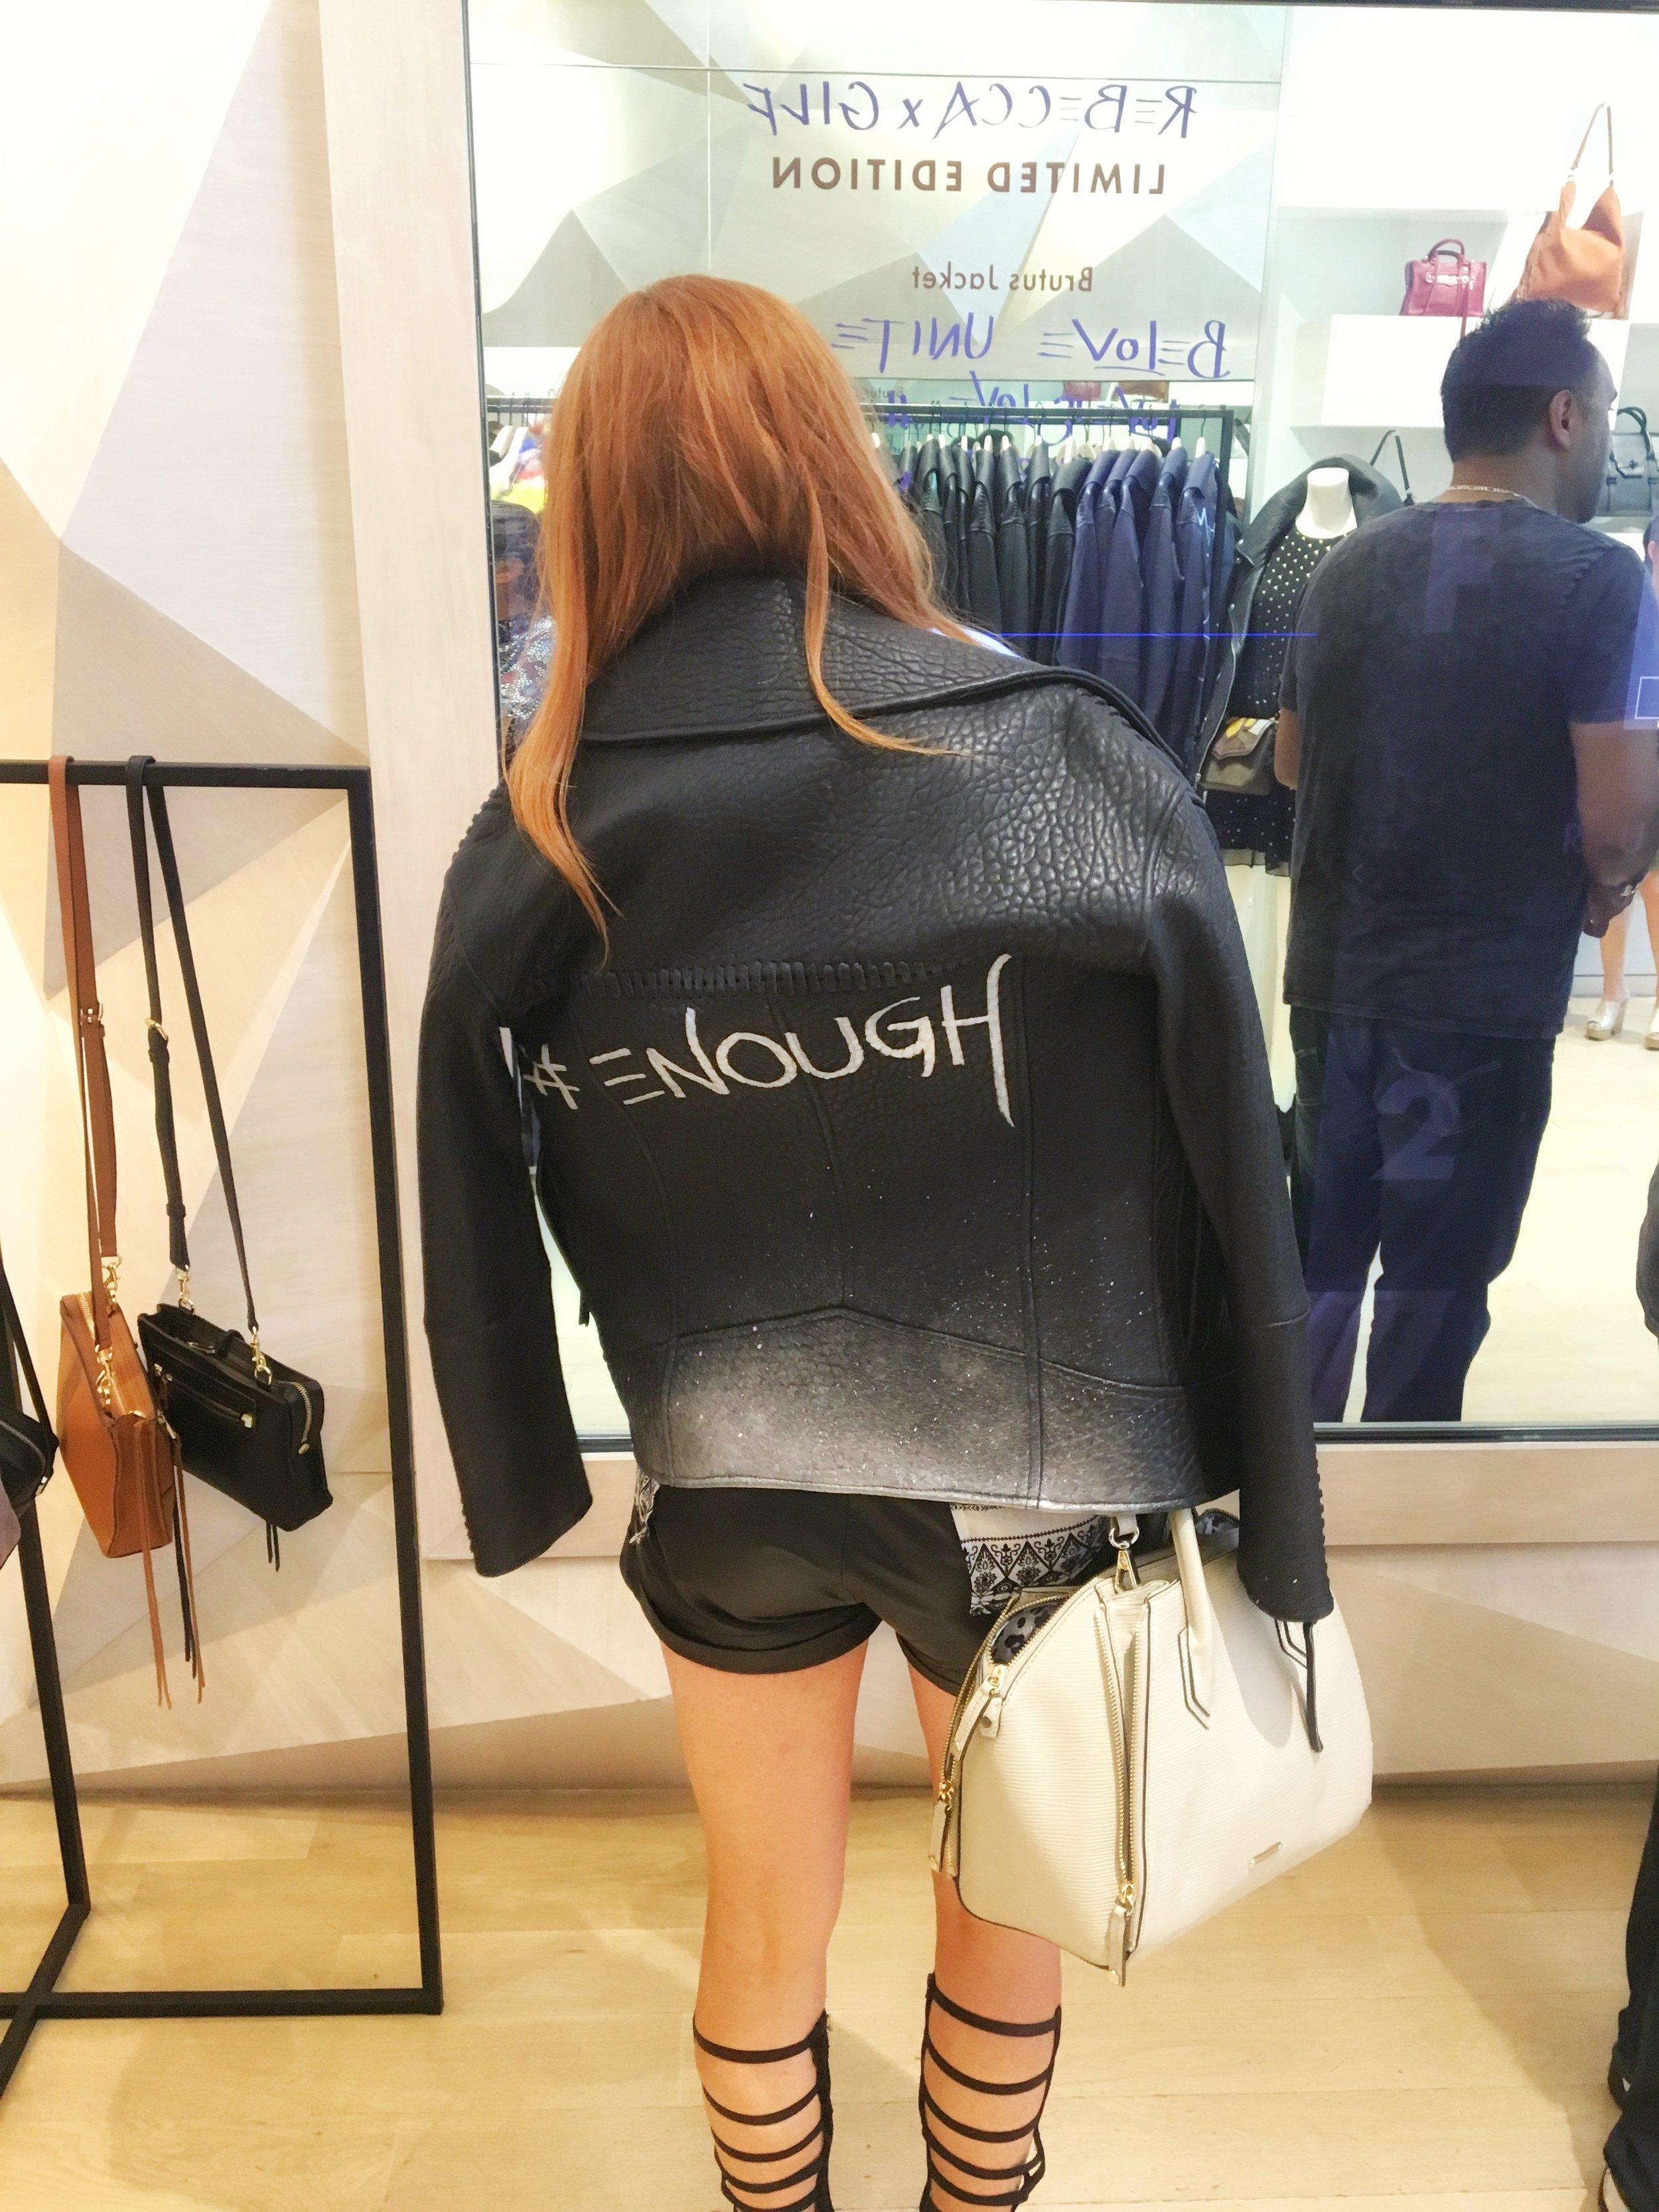 RM Jacket at NYFW 16.jpg